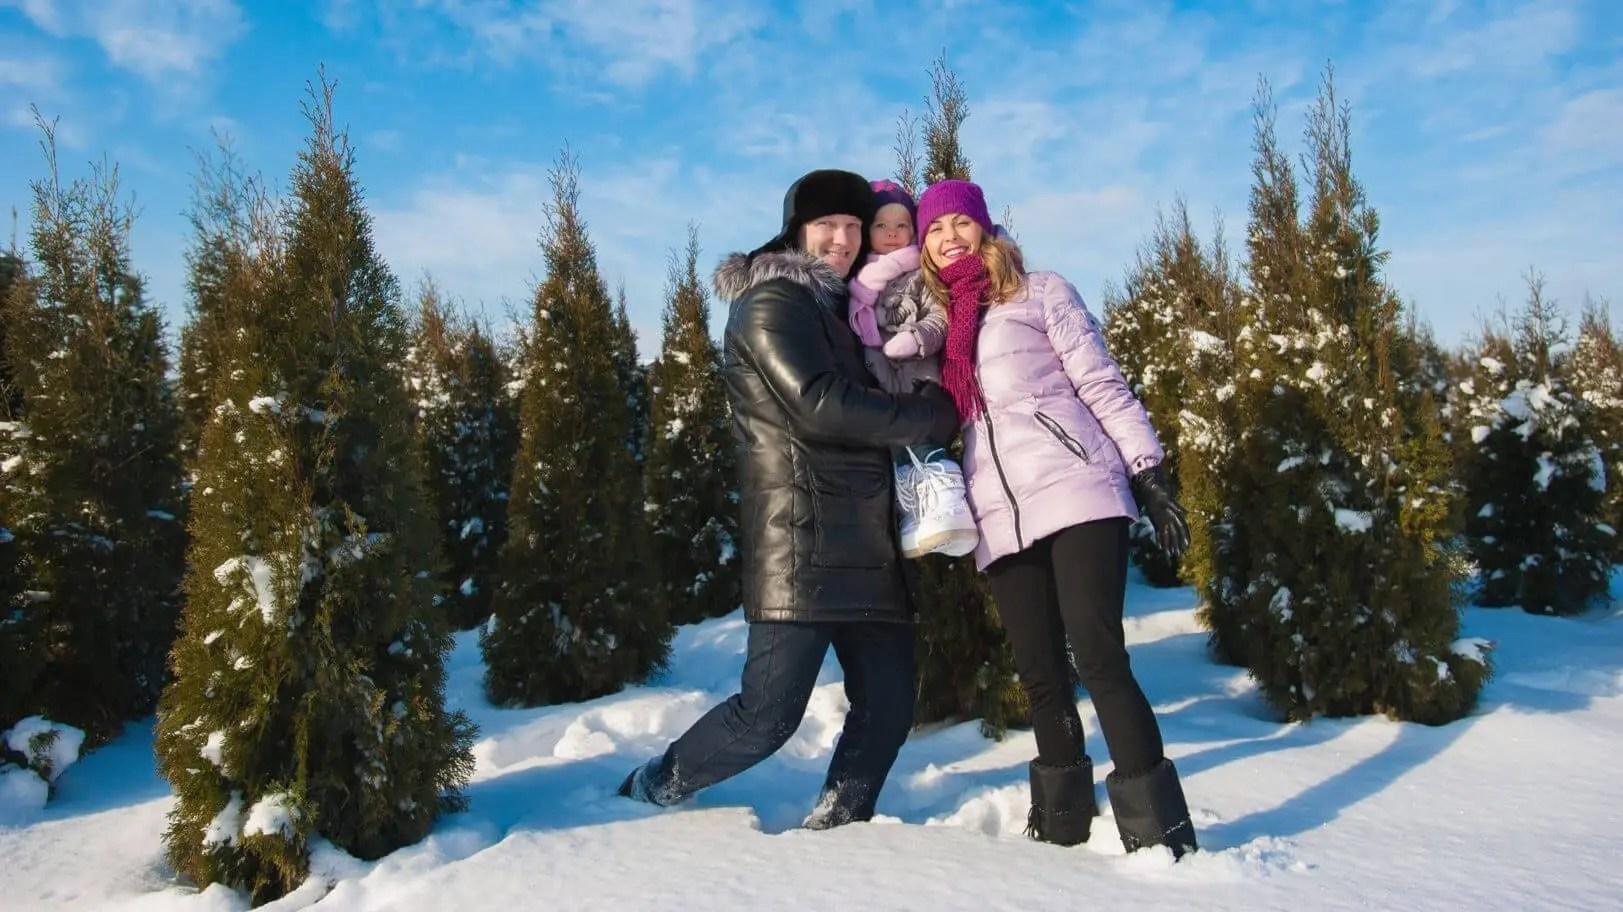 The Best Christmas Tree Farms in NJ - Best of NJ: The Best of NJ ...